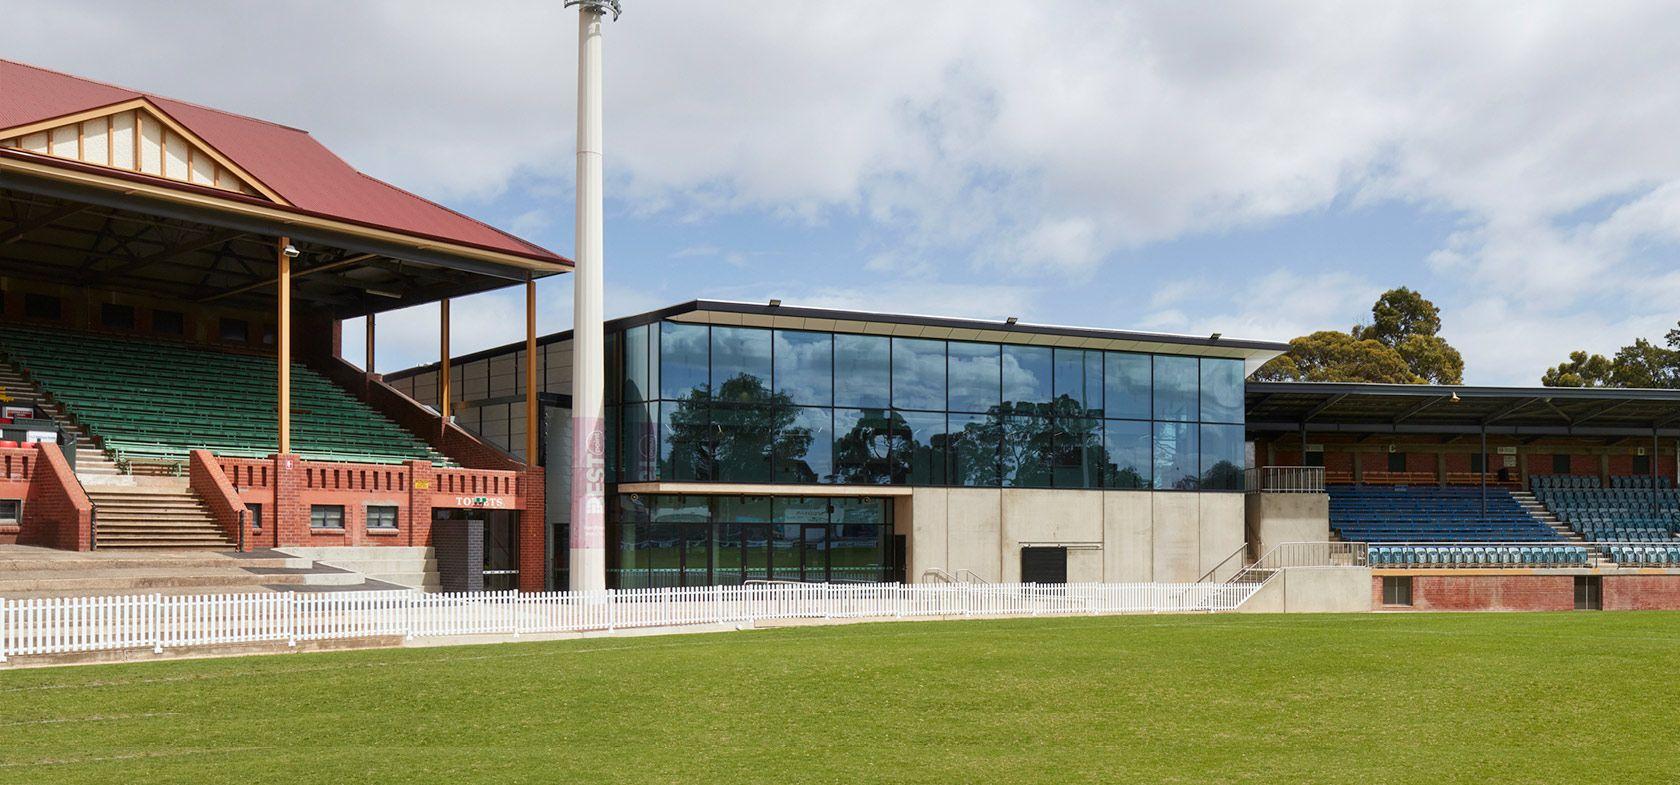 Norwood Oval